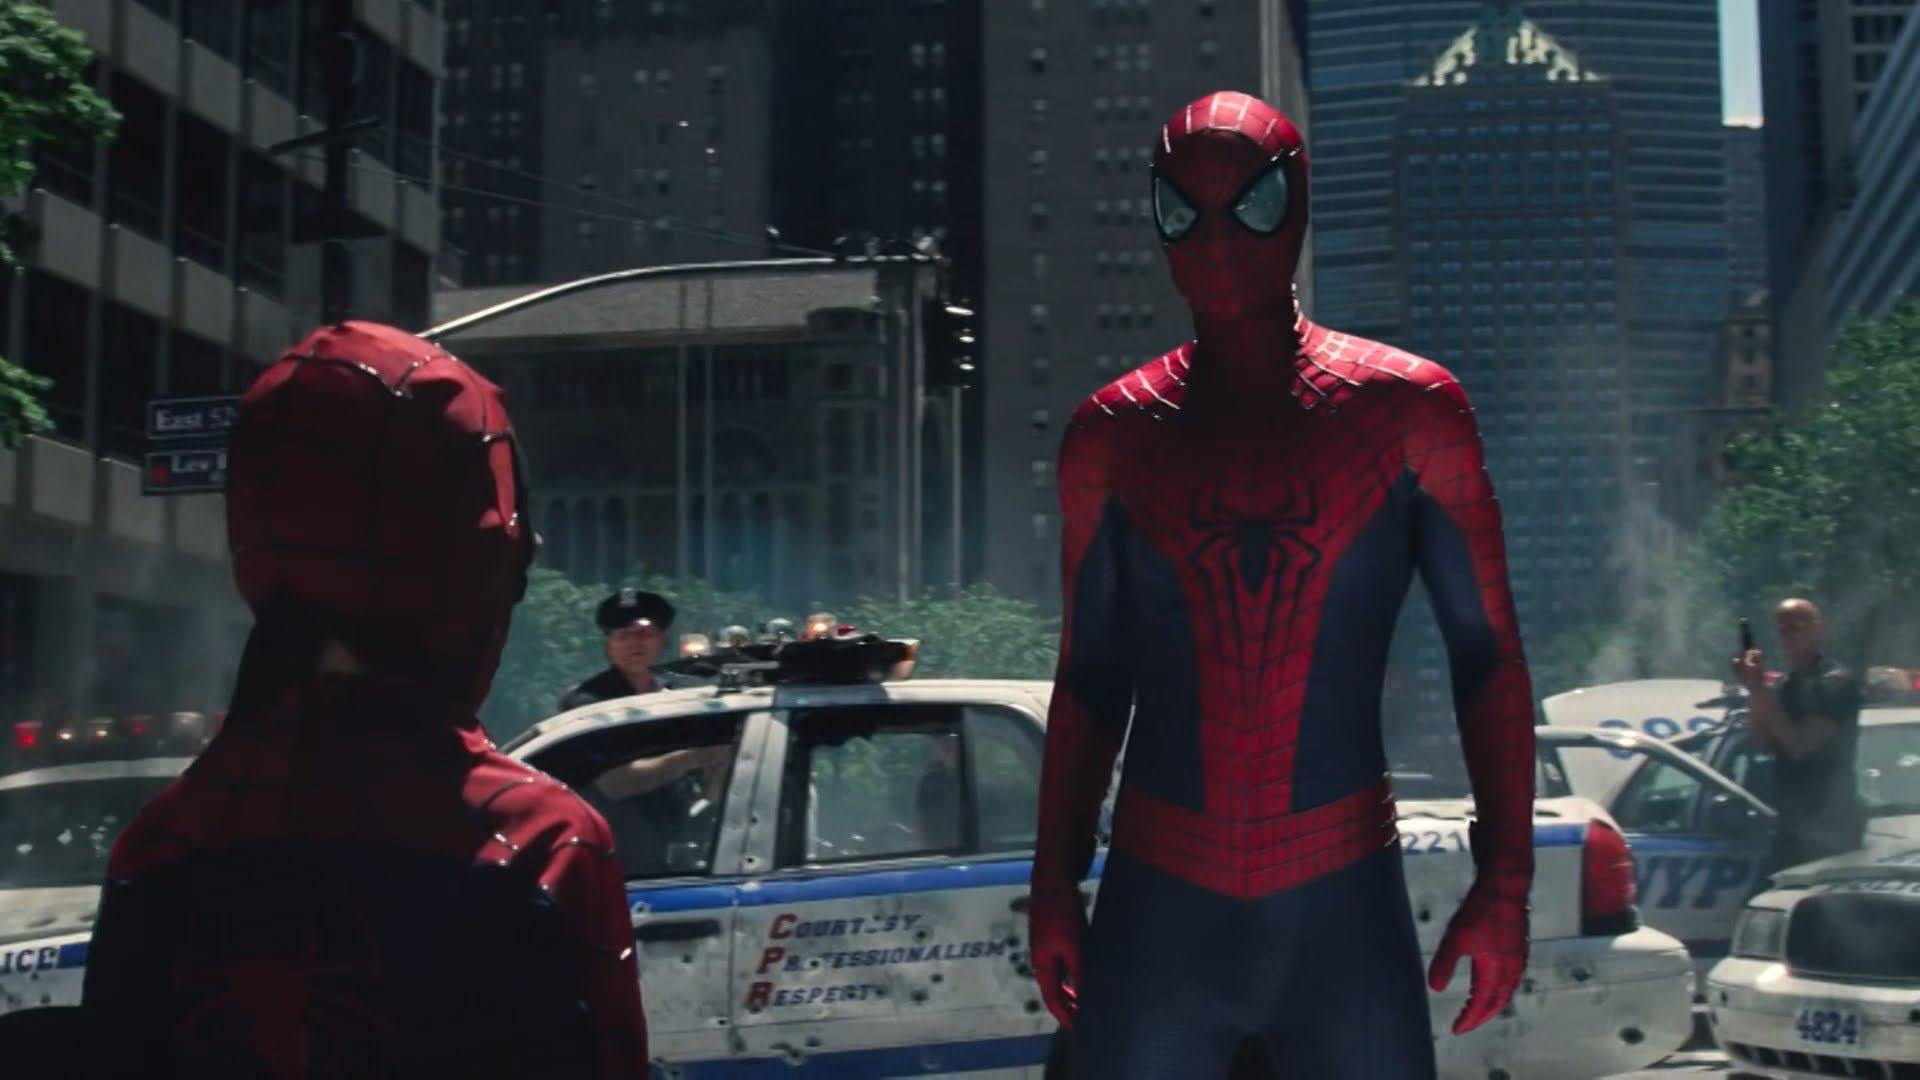 The amazing spider man 2 watch now online